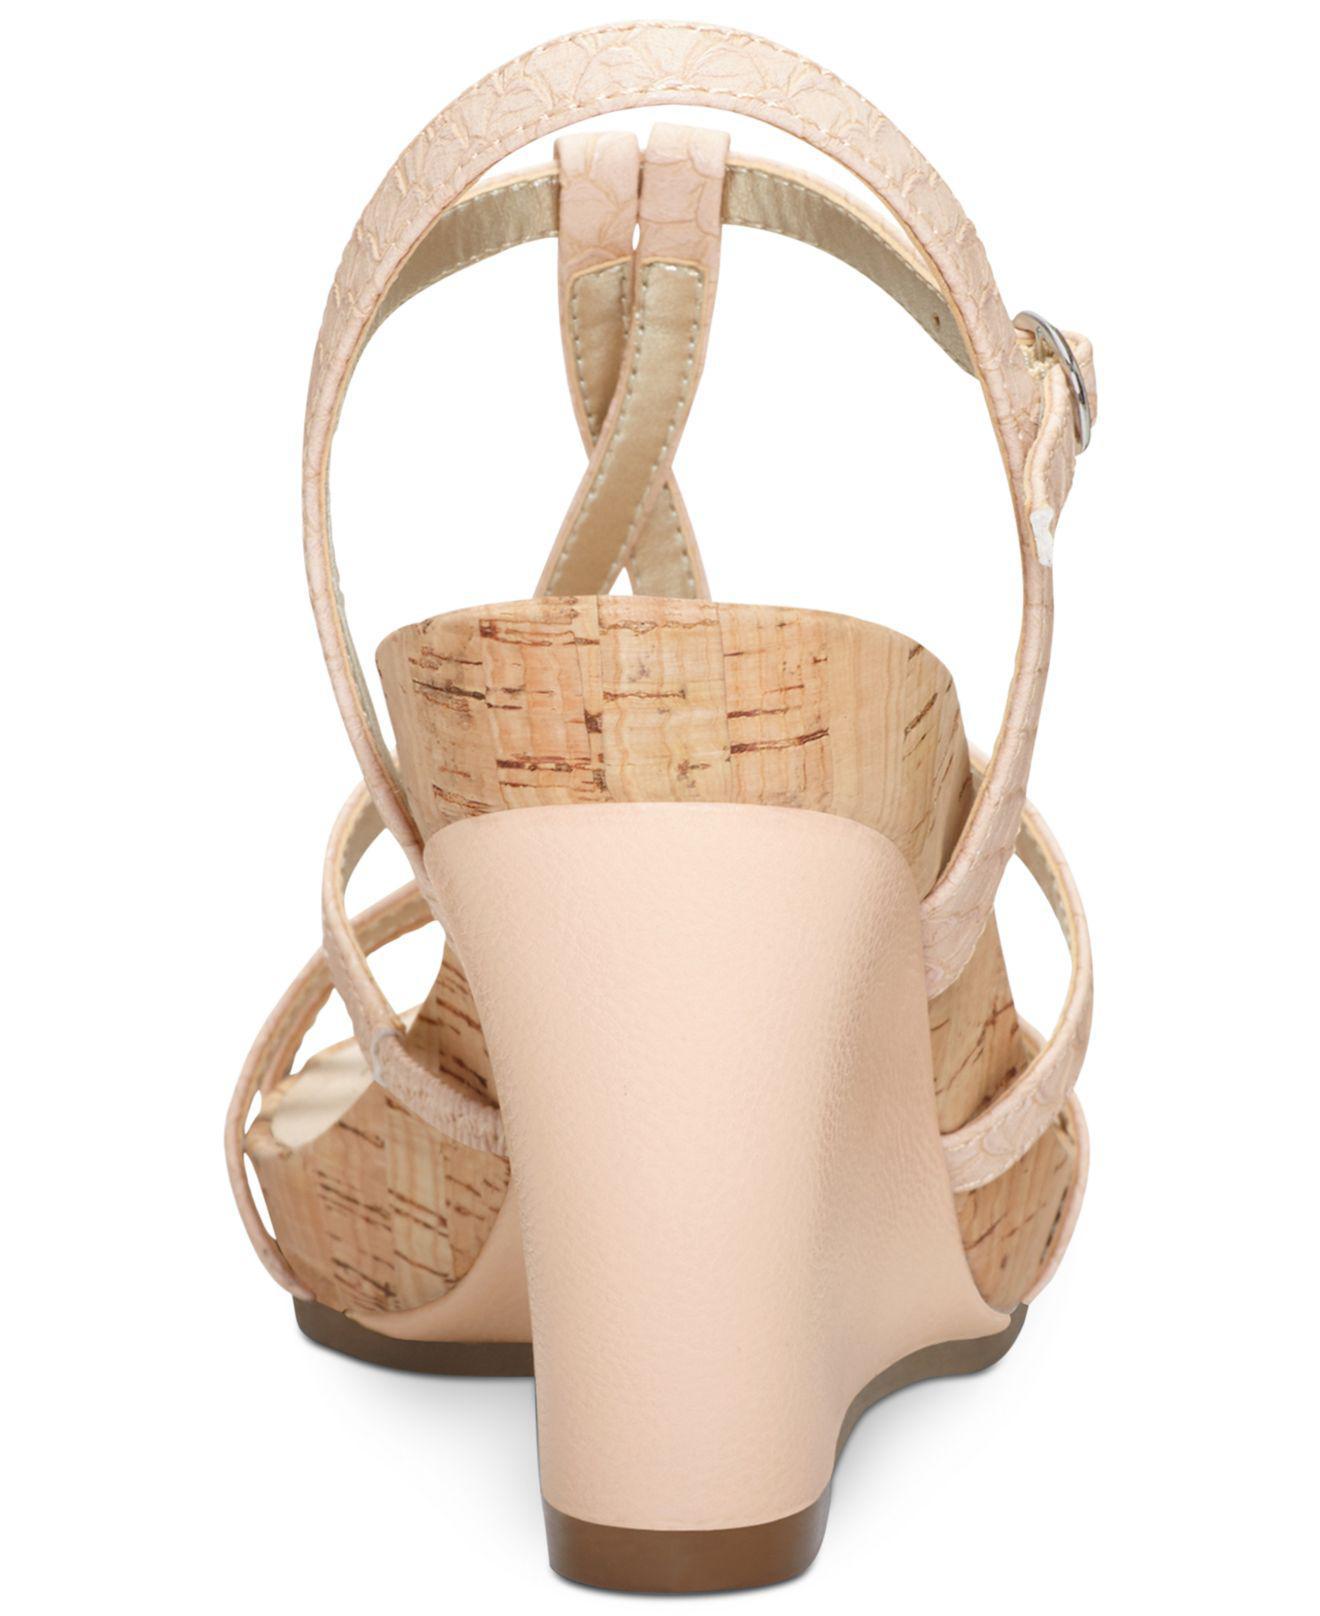 4d1efb09e35 Lyst - Aerosoles Plush Song Wedge Sandals